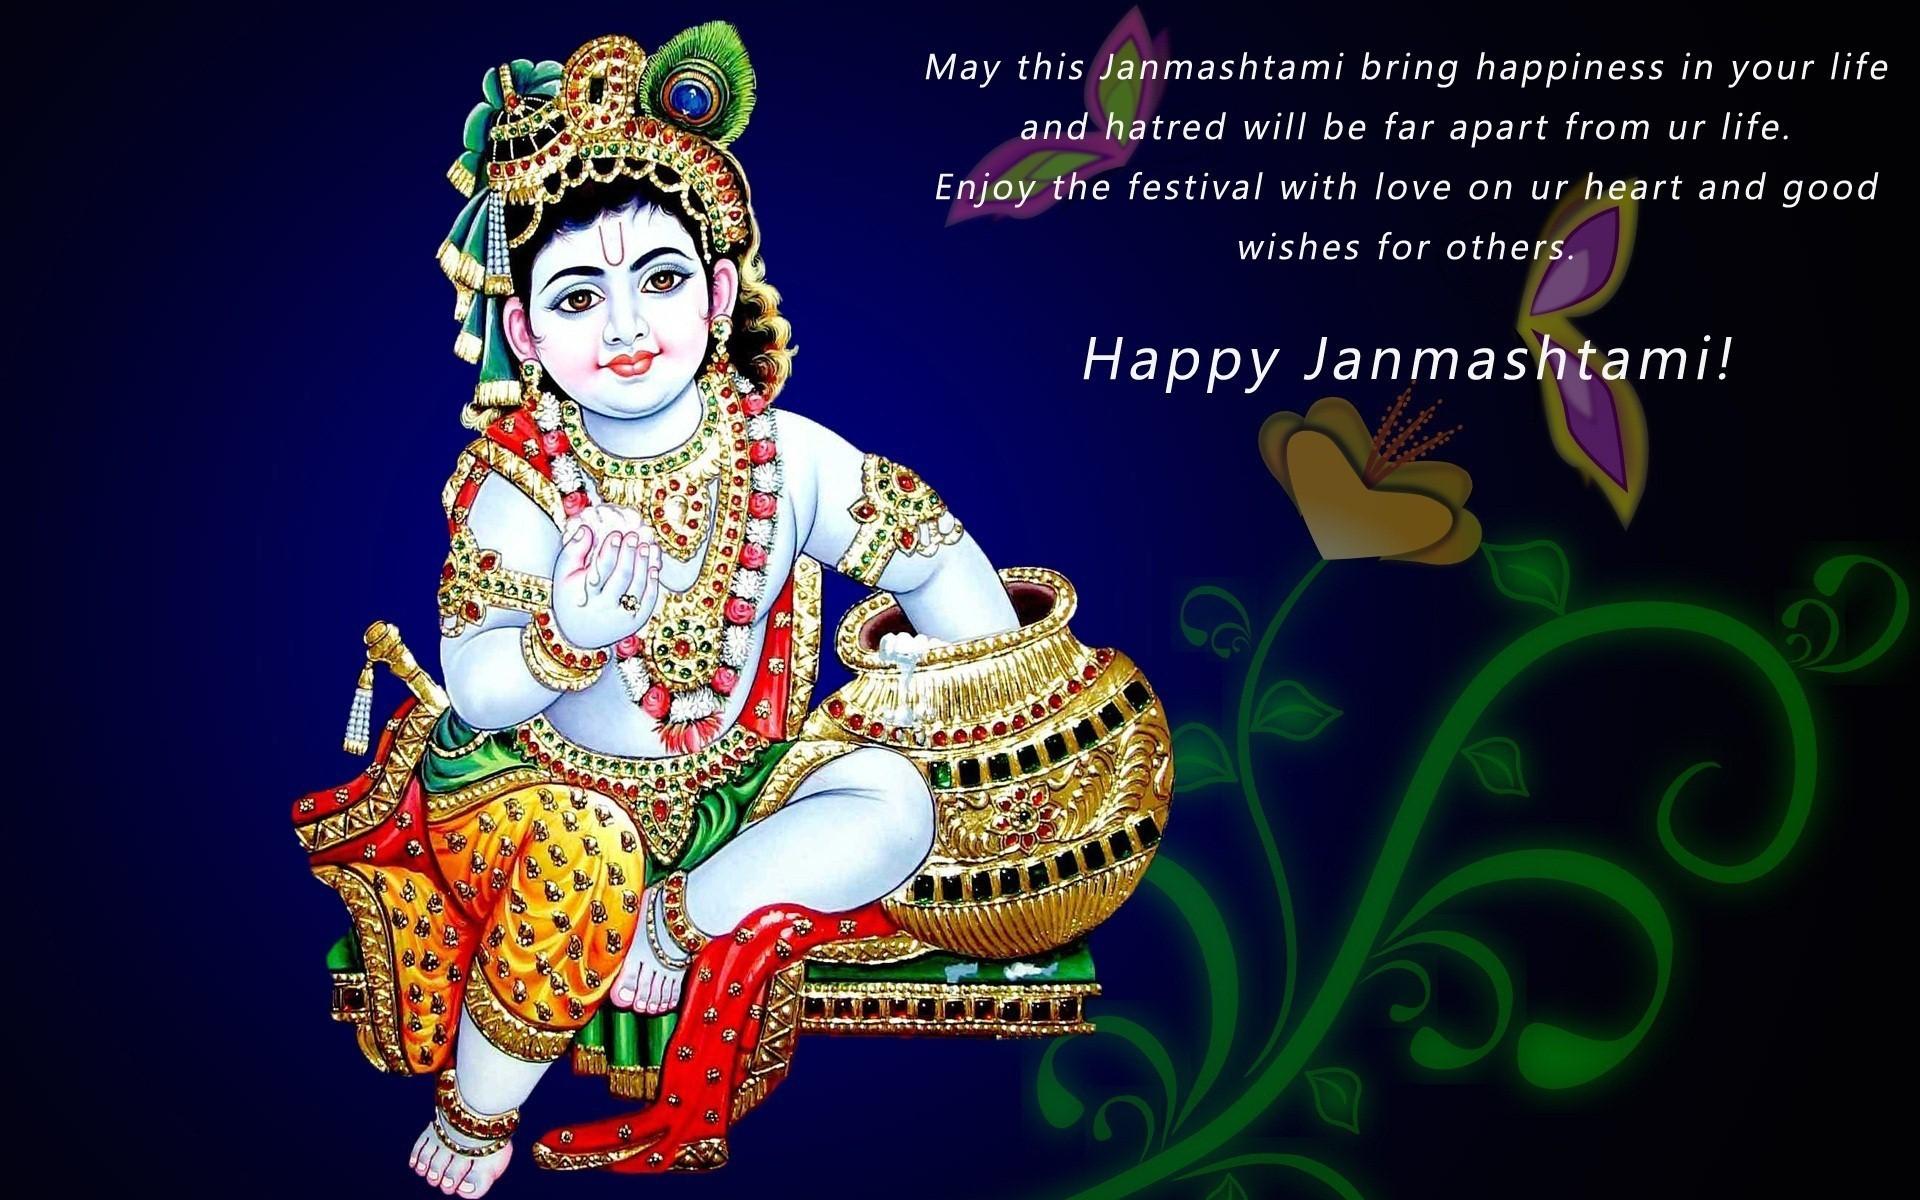 Wish You Krishna Happy Janmashtami Wallpaper - Krishna Janmashtami Date 2019 - HD Wallpaper